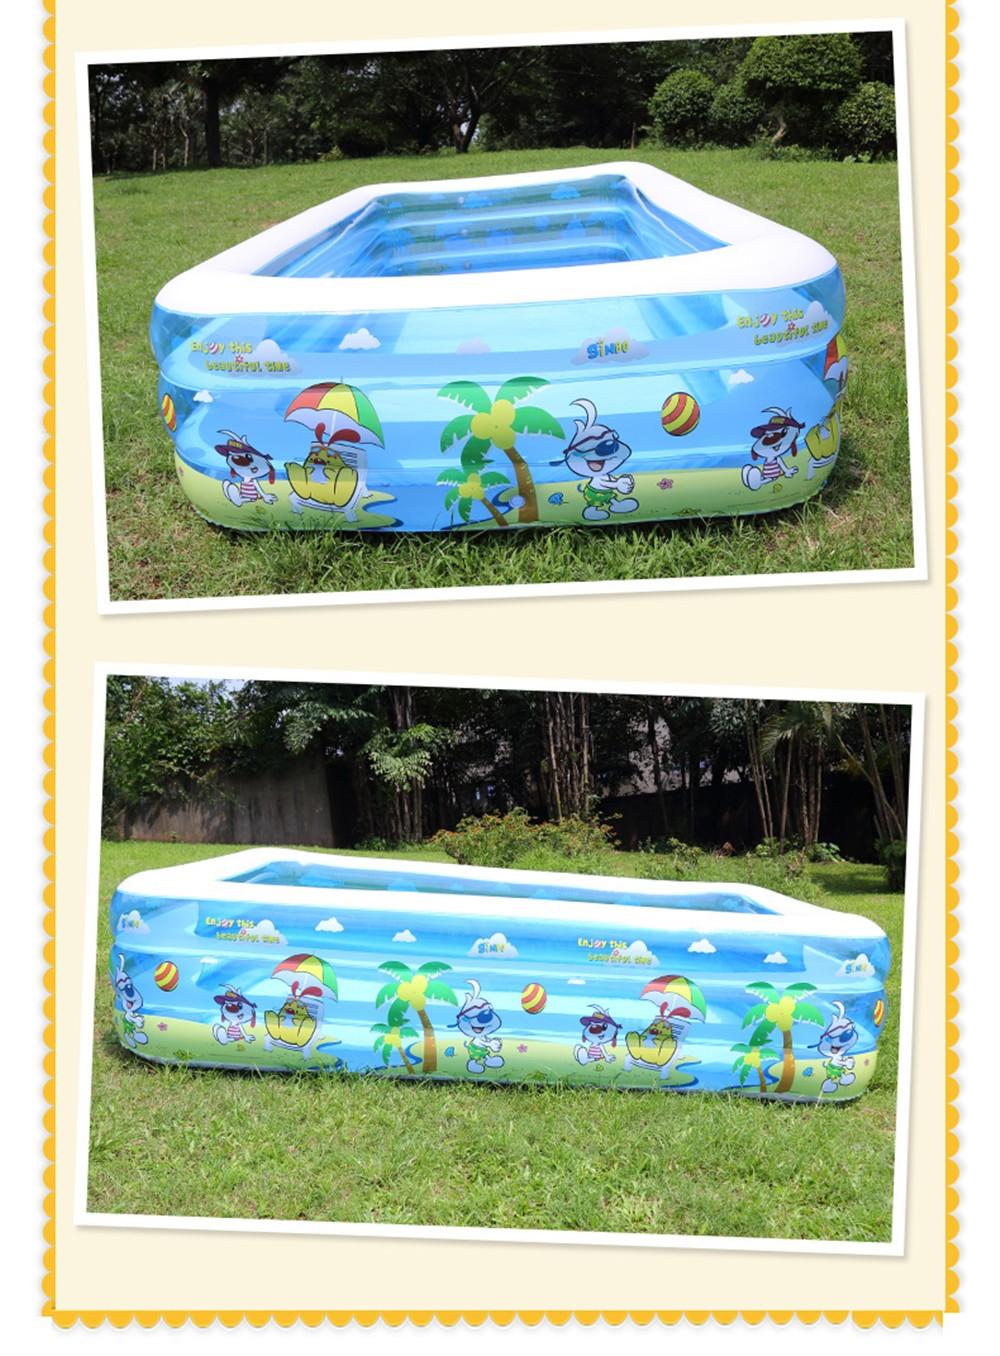 swimmming pool 3